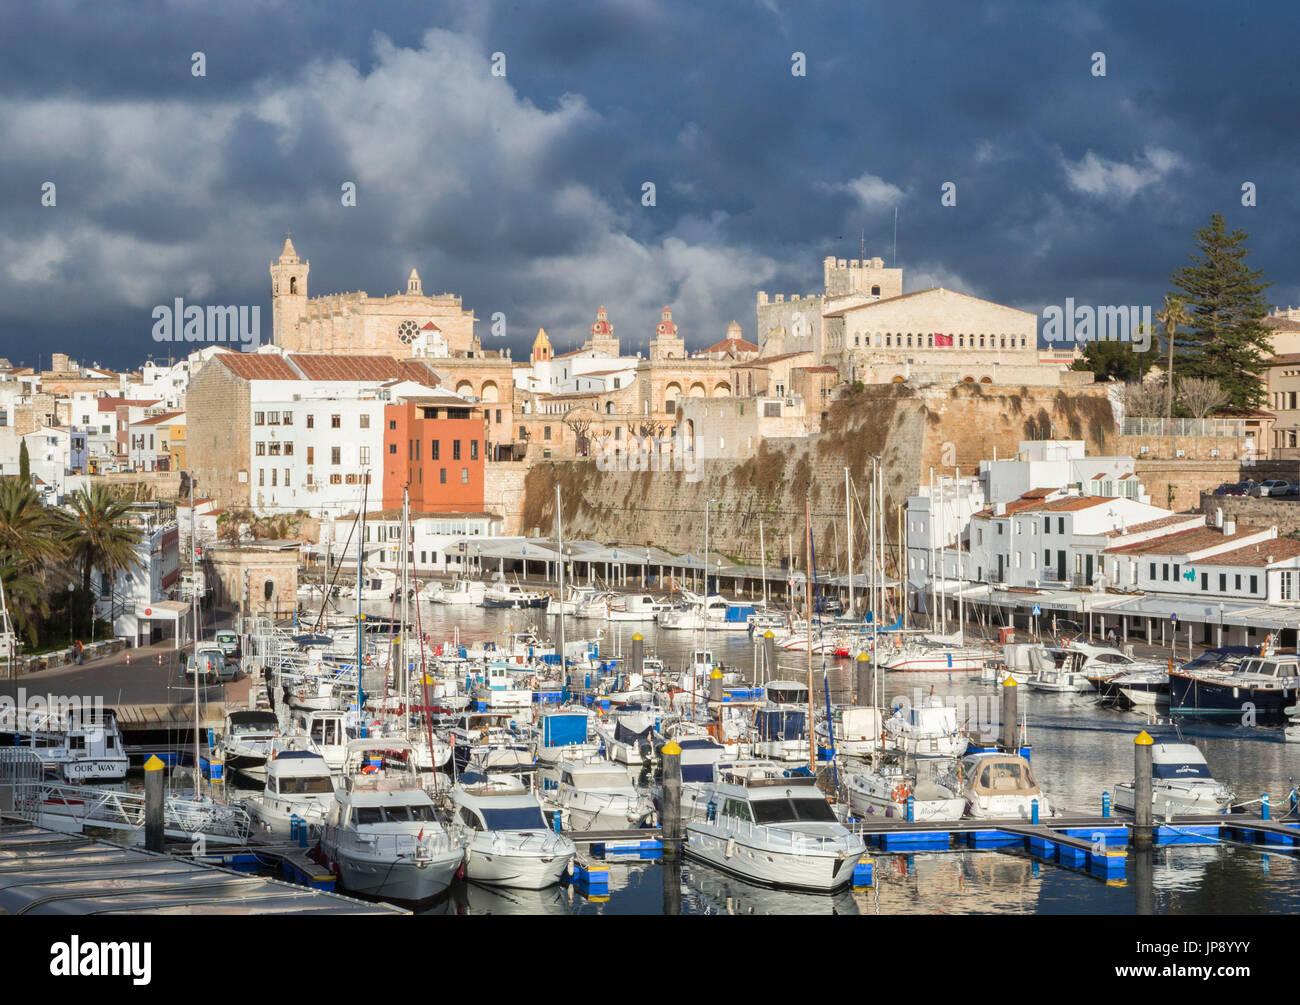 Spain, Balearic Islands, Menorca Island, Ciutadella City and port - Stock Image